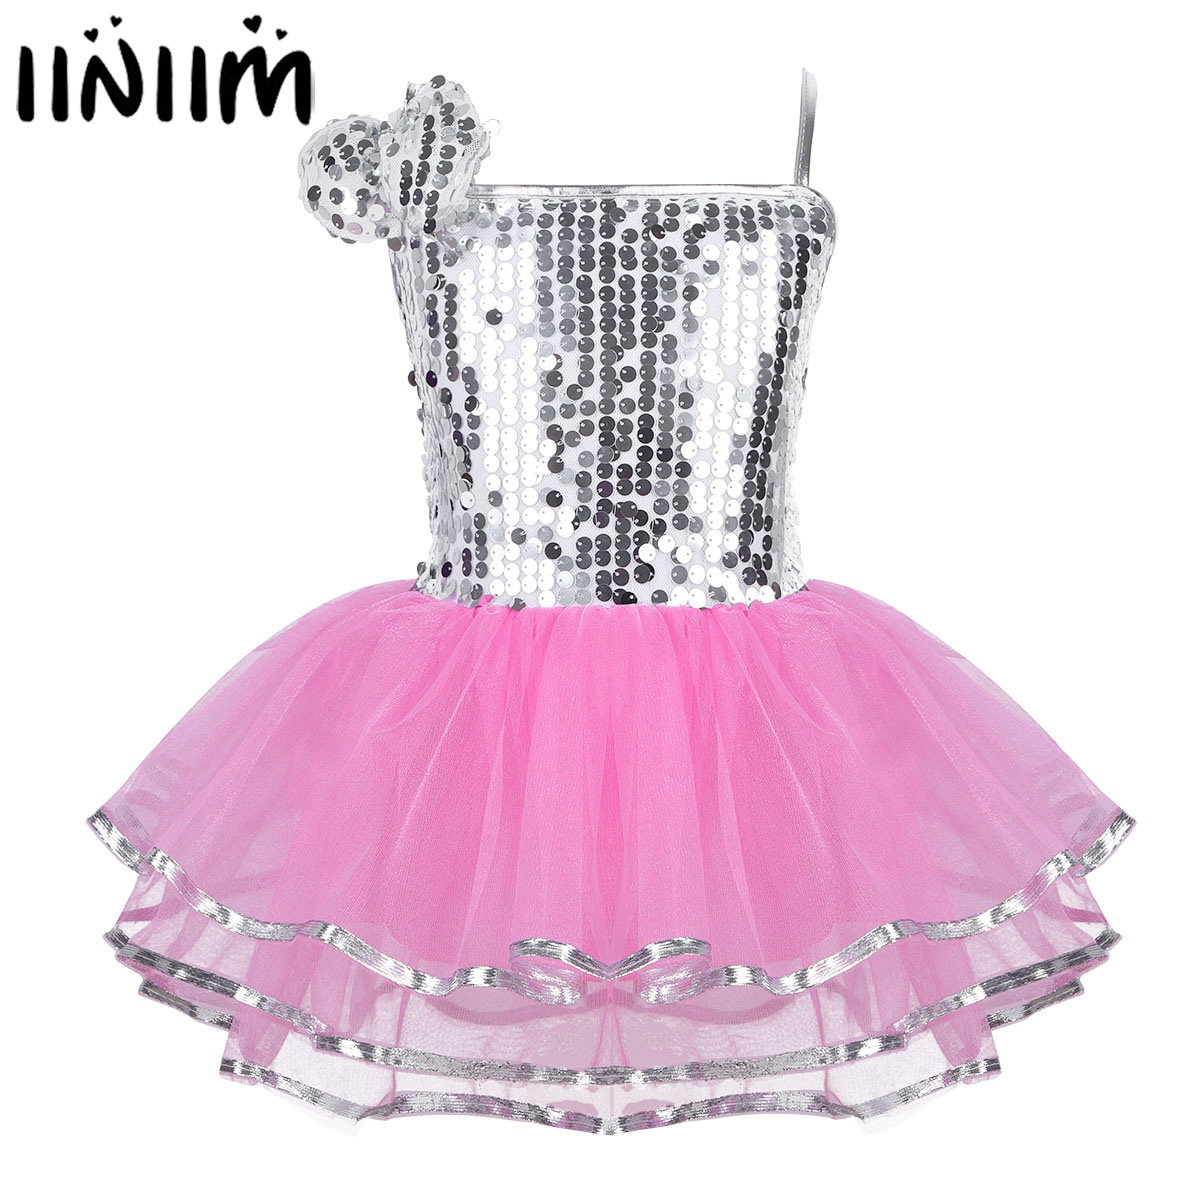 Kids Girls Modern Ballet Dance Dress Lyrical Tulle Skirt Dancewear Gym Costumes